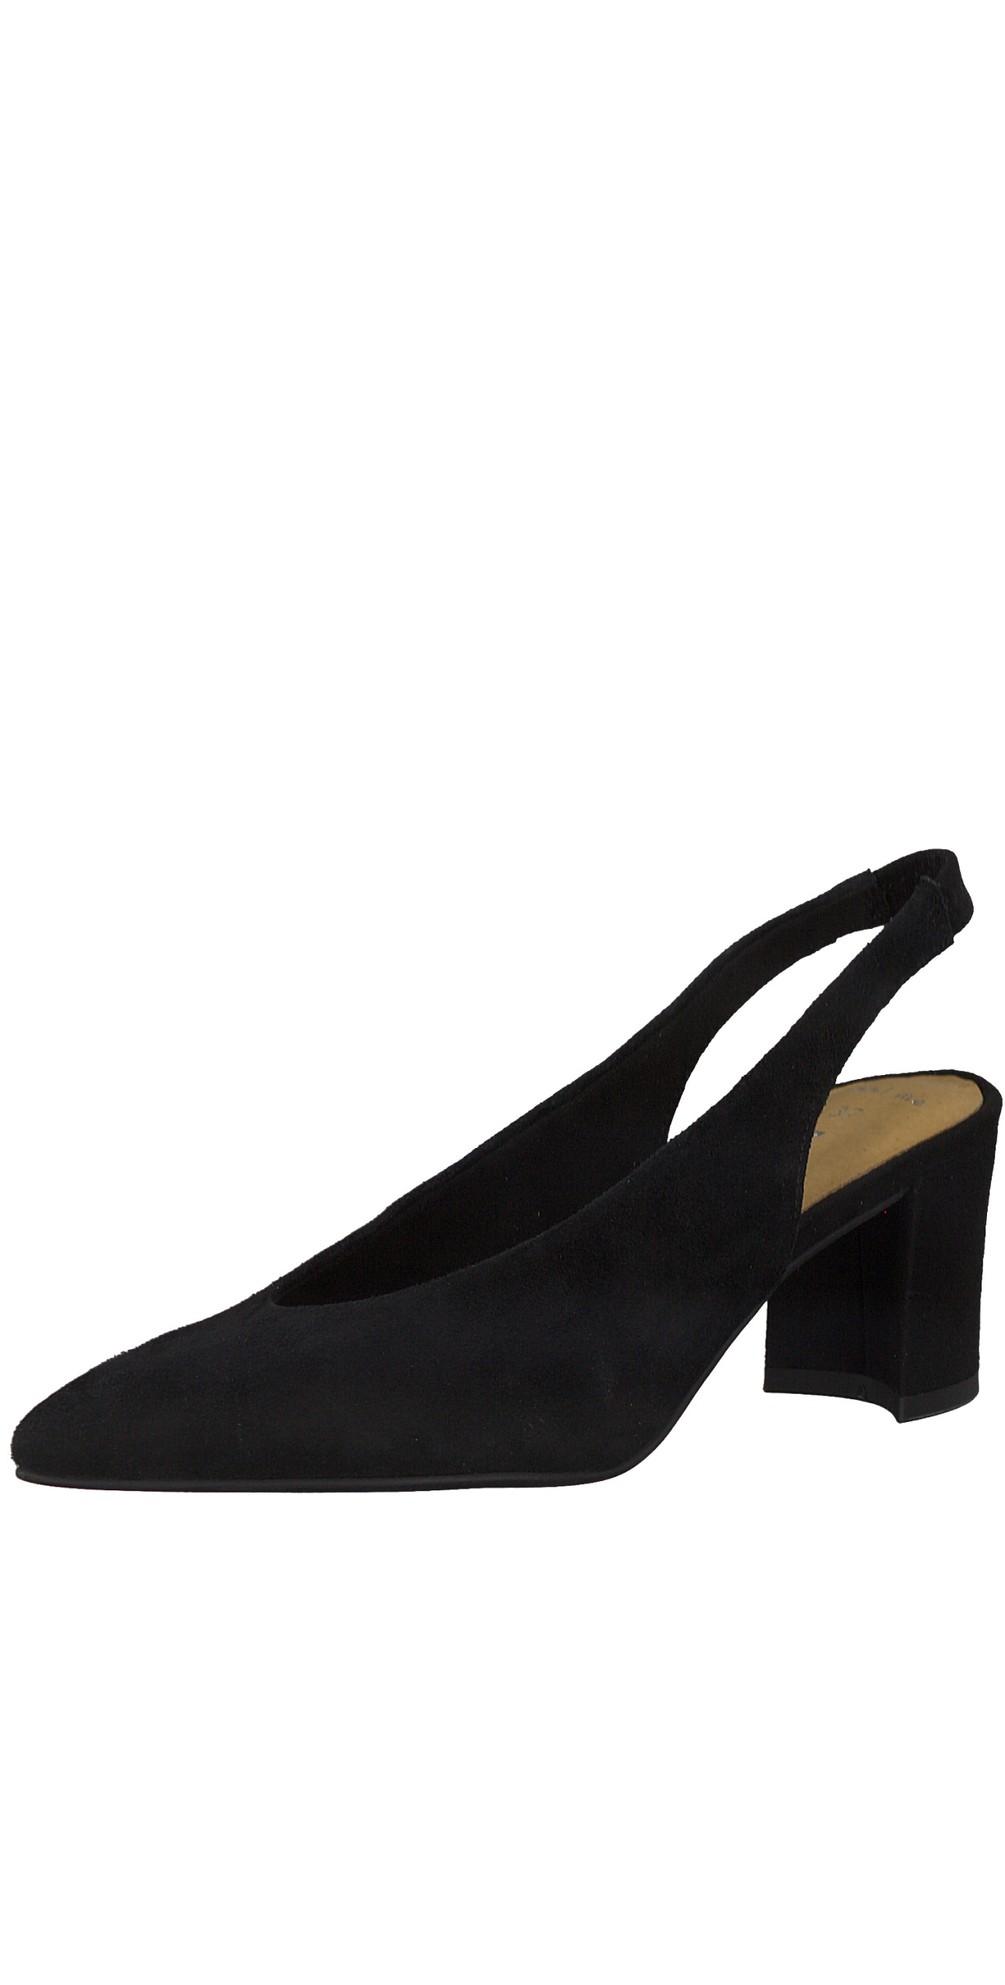 Baci Shoe main image